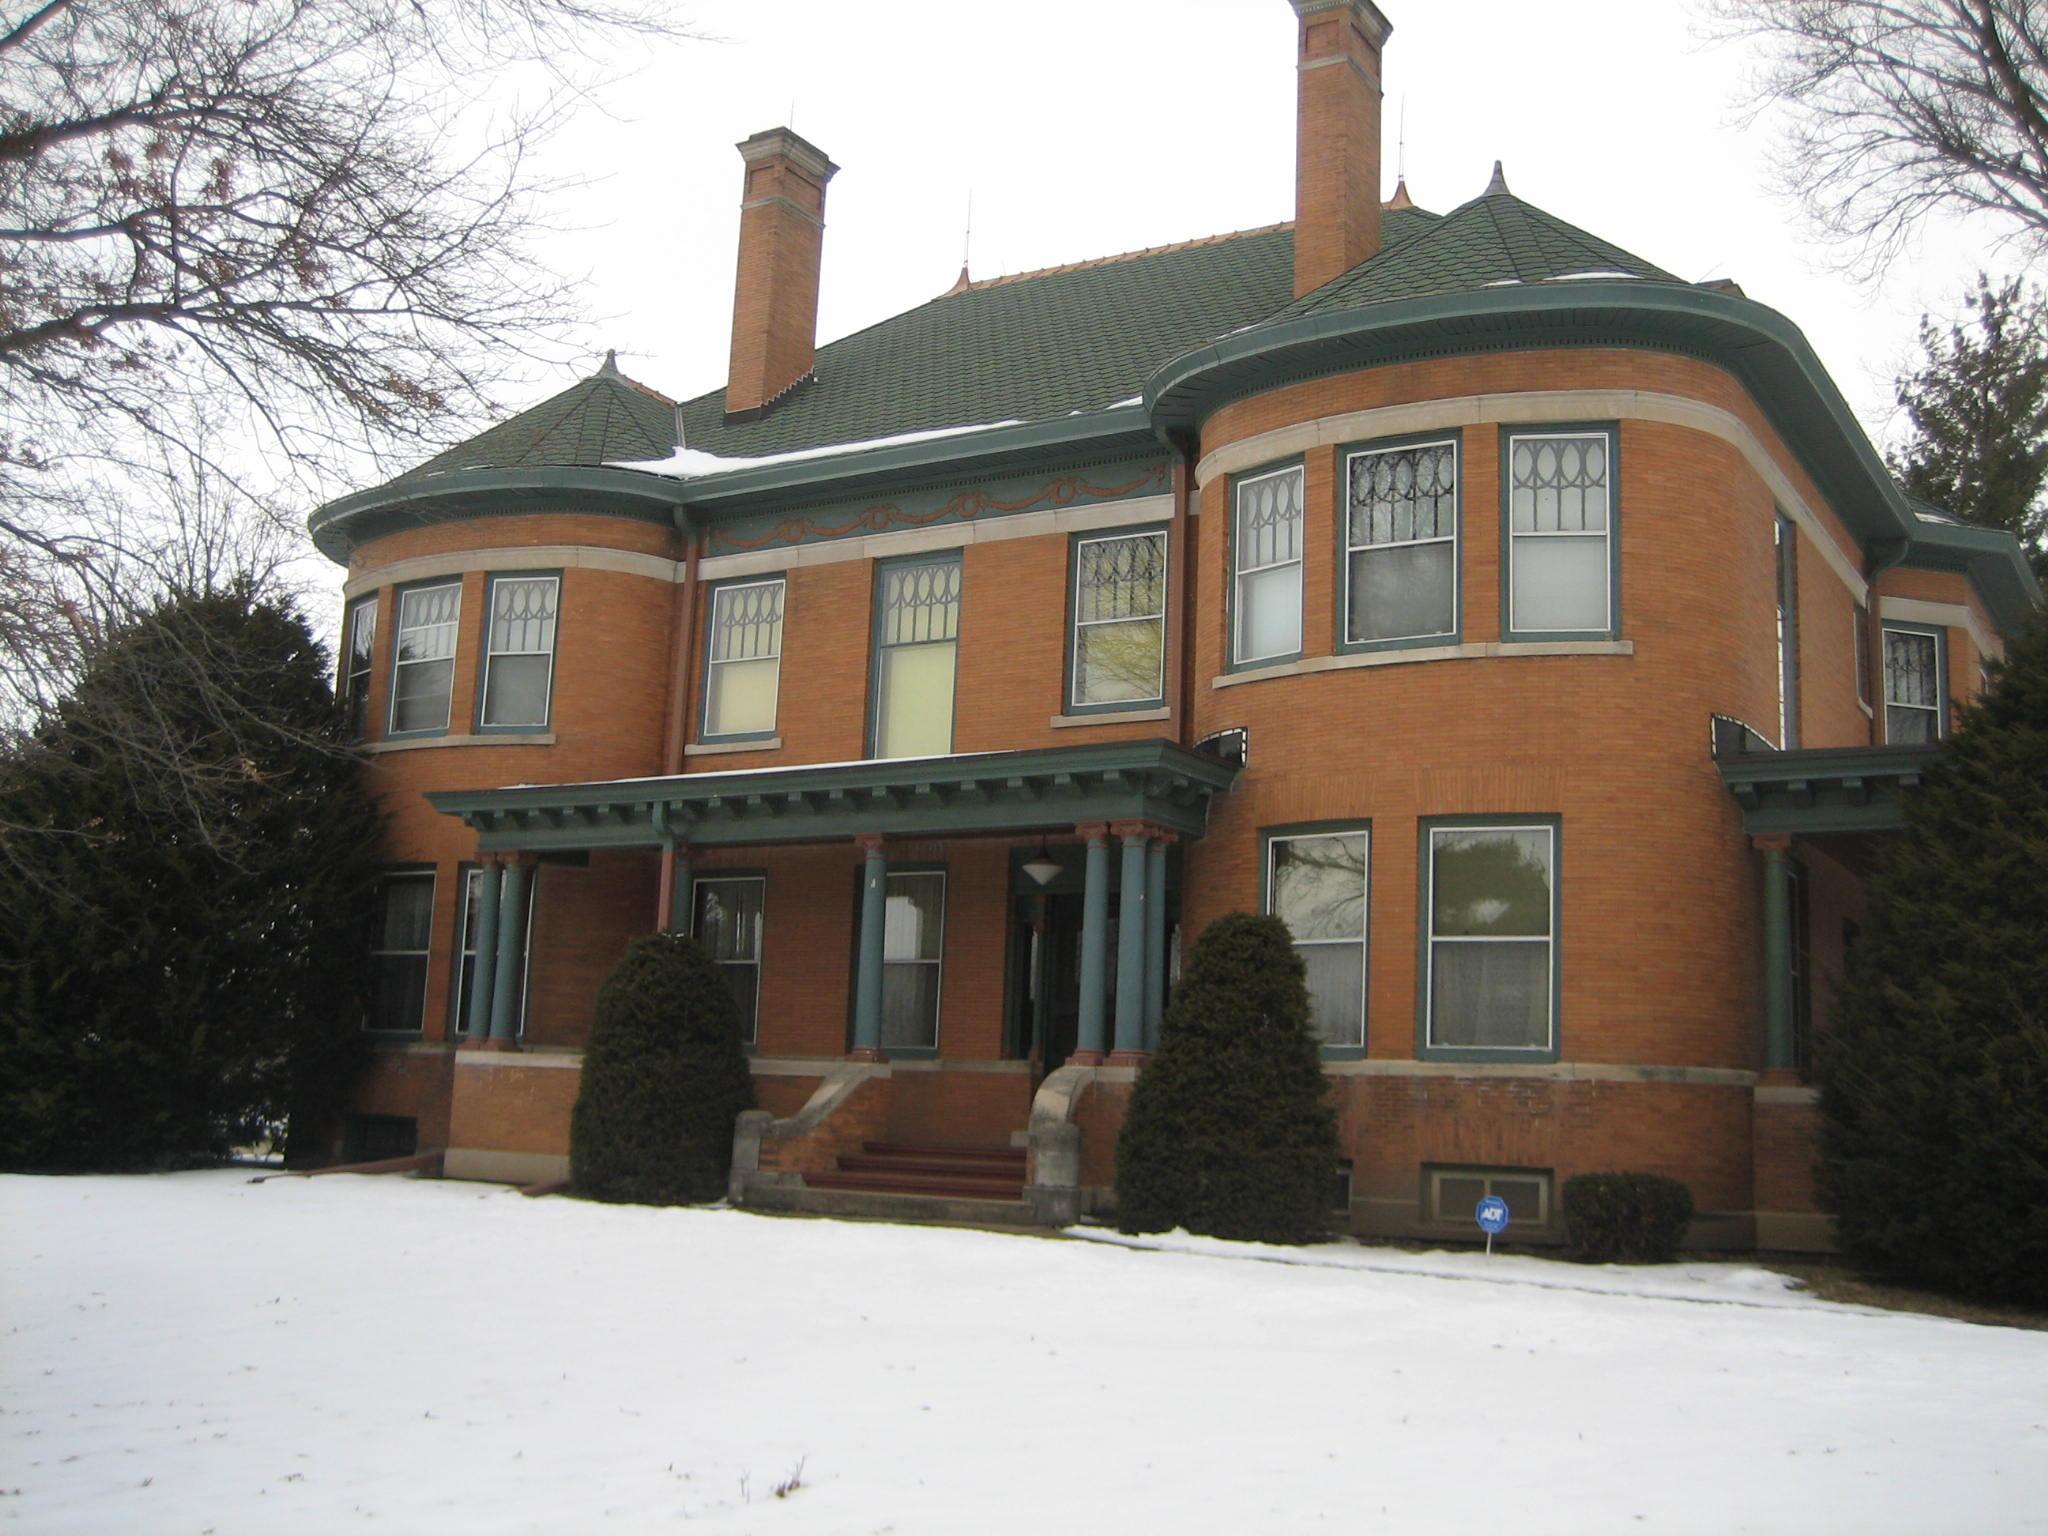 Illinois ogle county polo - File Ogle County Polo Il H D Barber House1 Jpg